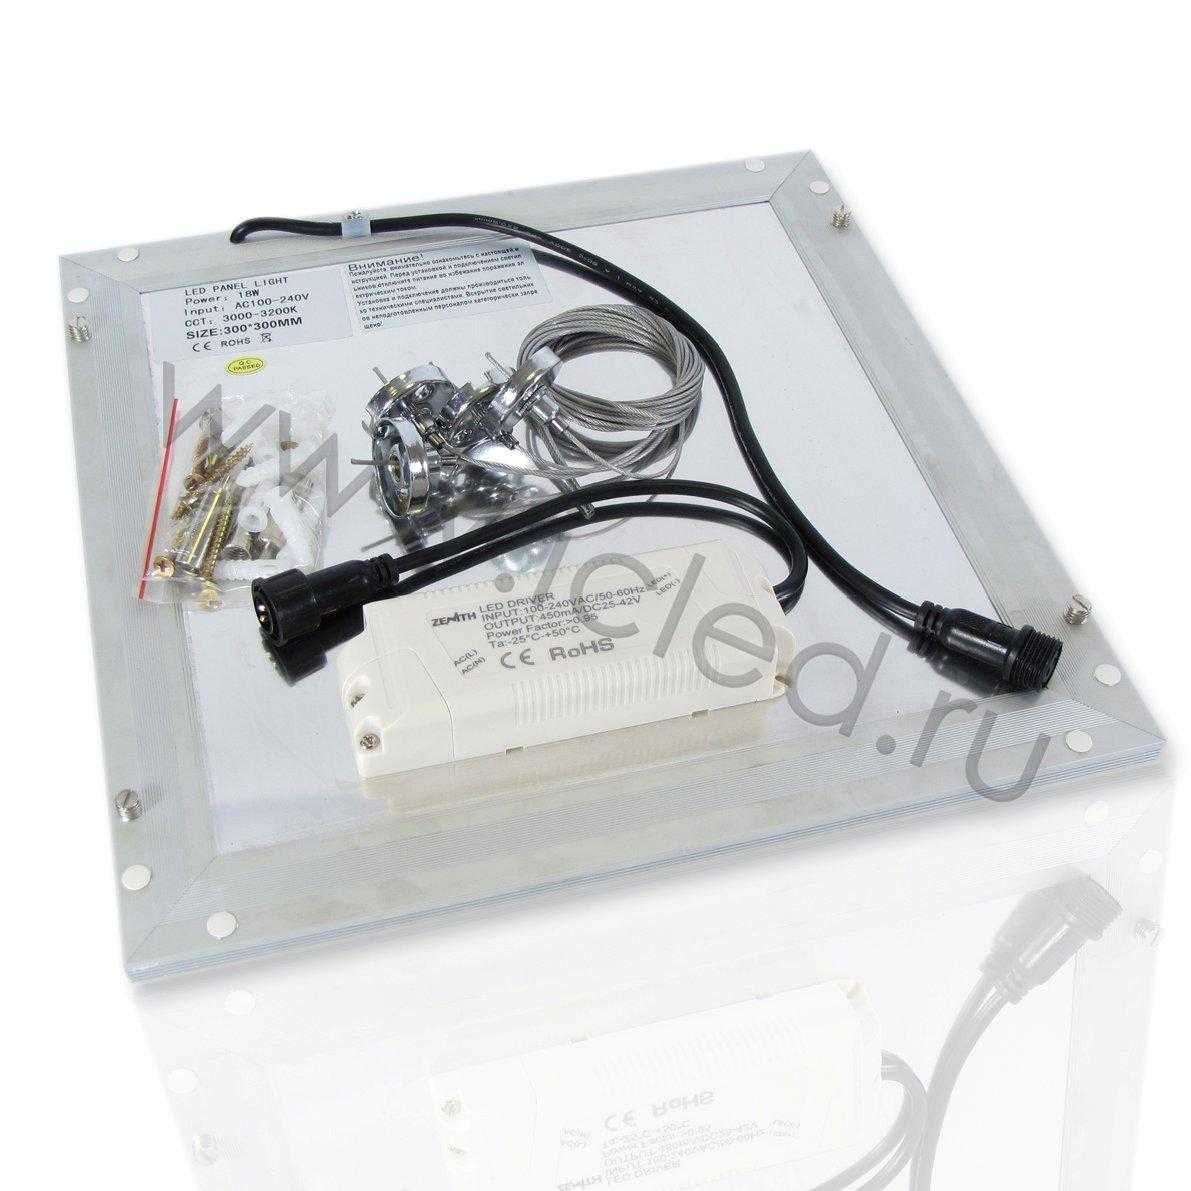 Светодиодная панель S L300 DIAMOND (18W, 220V, White)